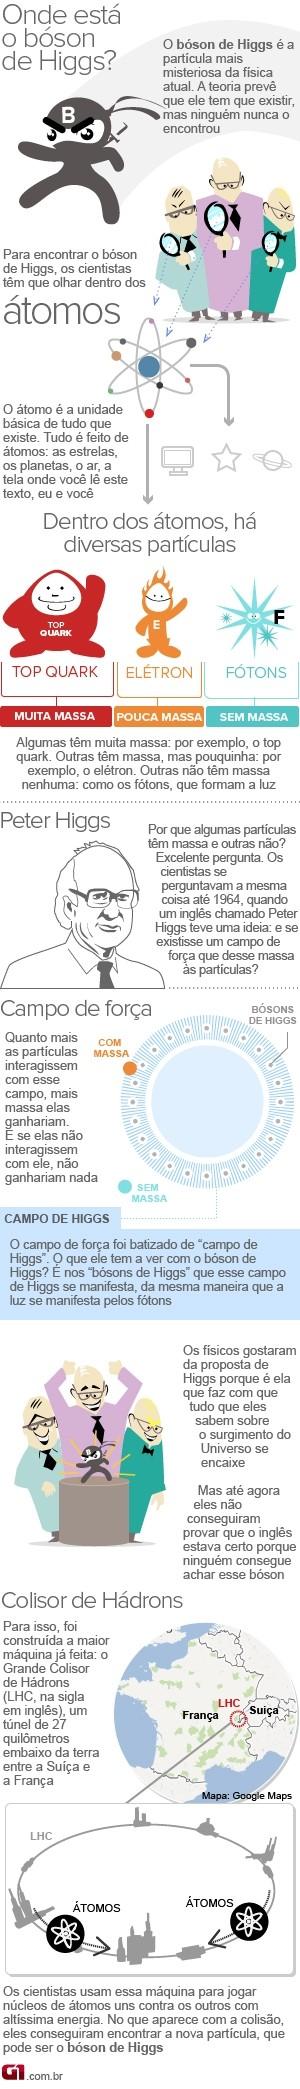 Infográfico Bóson de Higgs (Foto: Arte/G1)